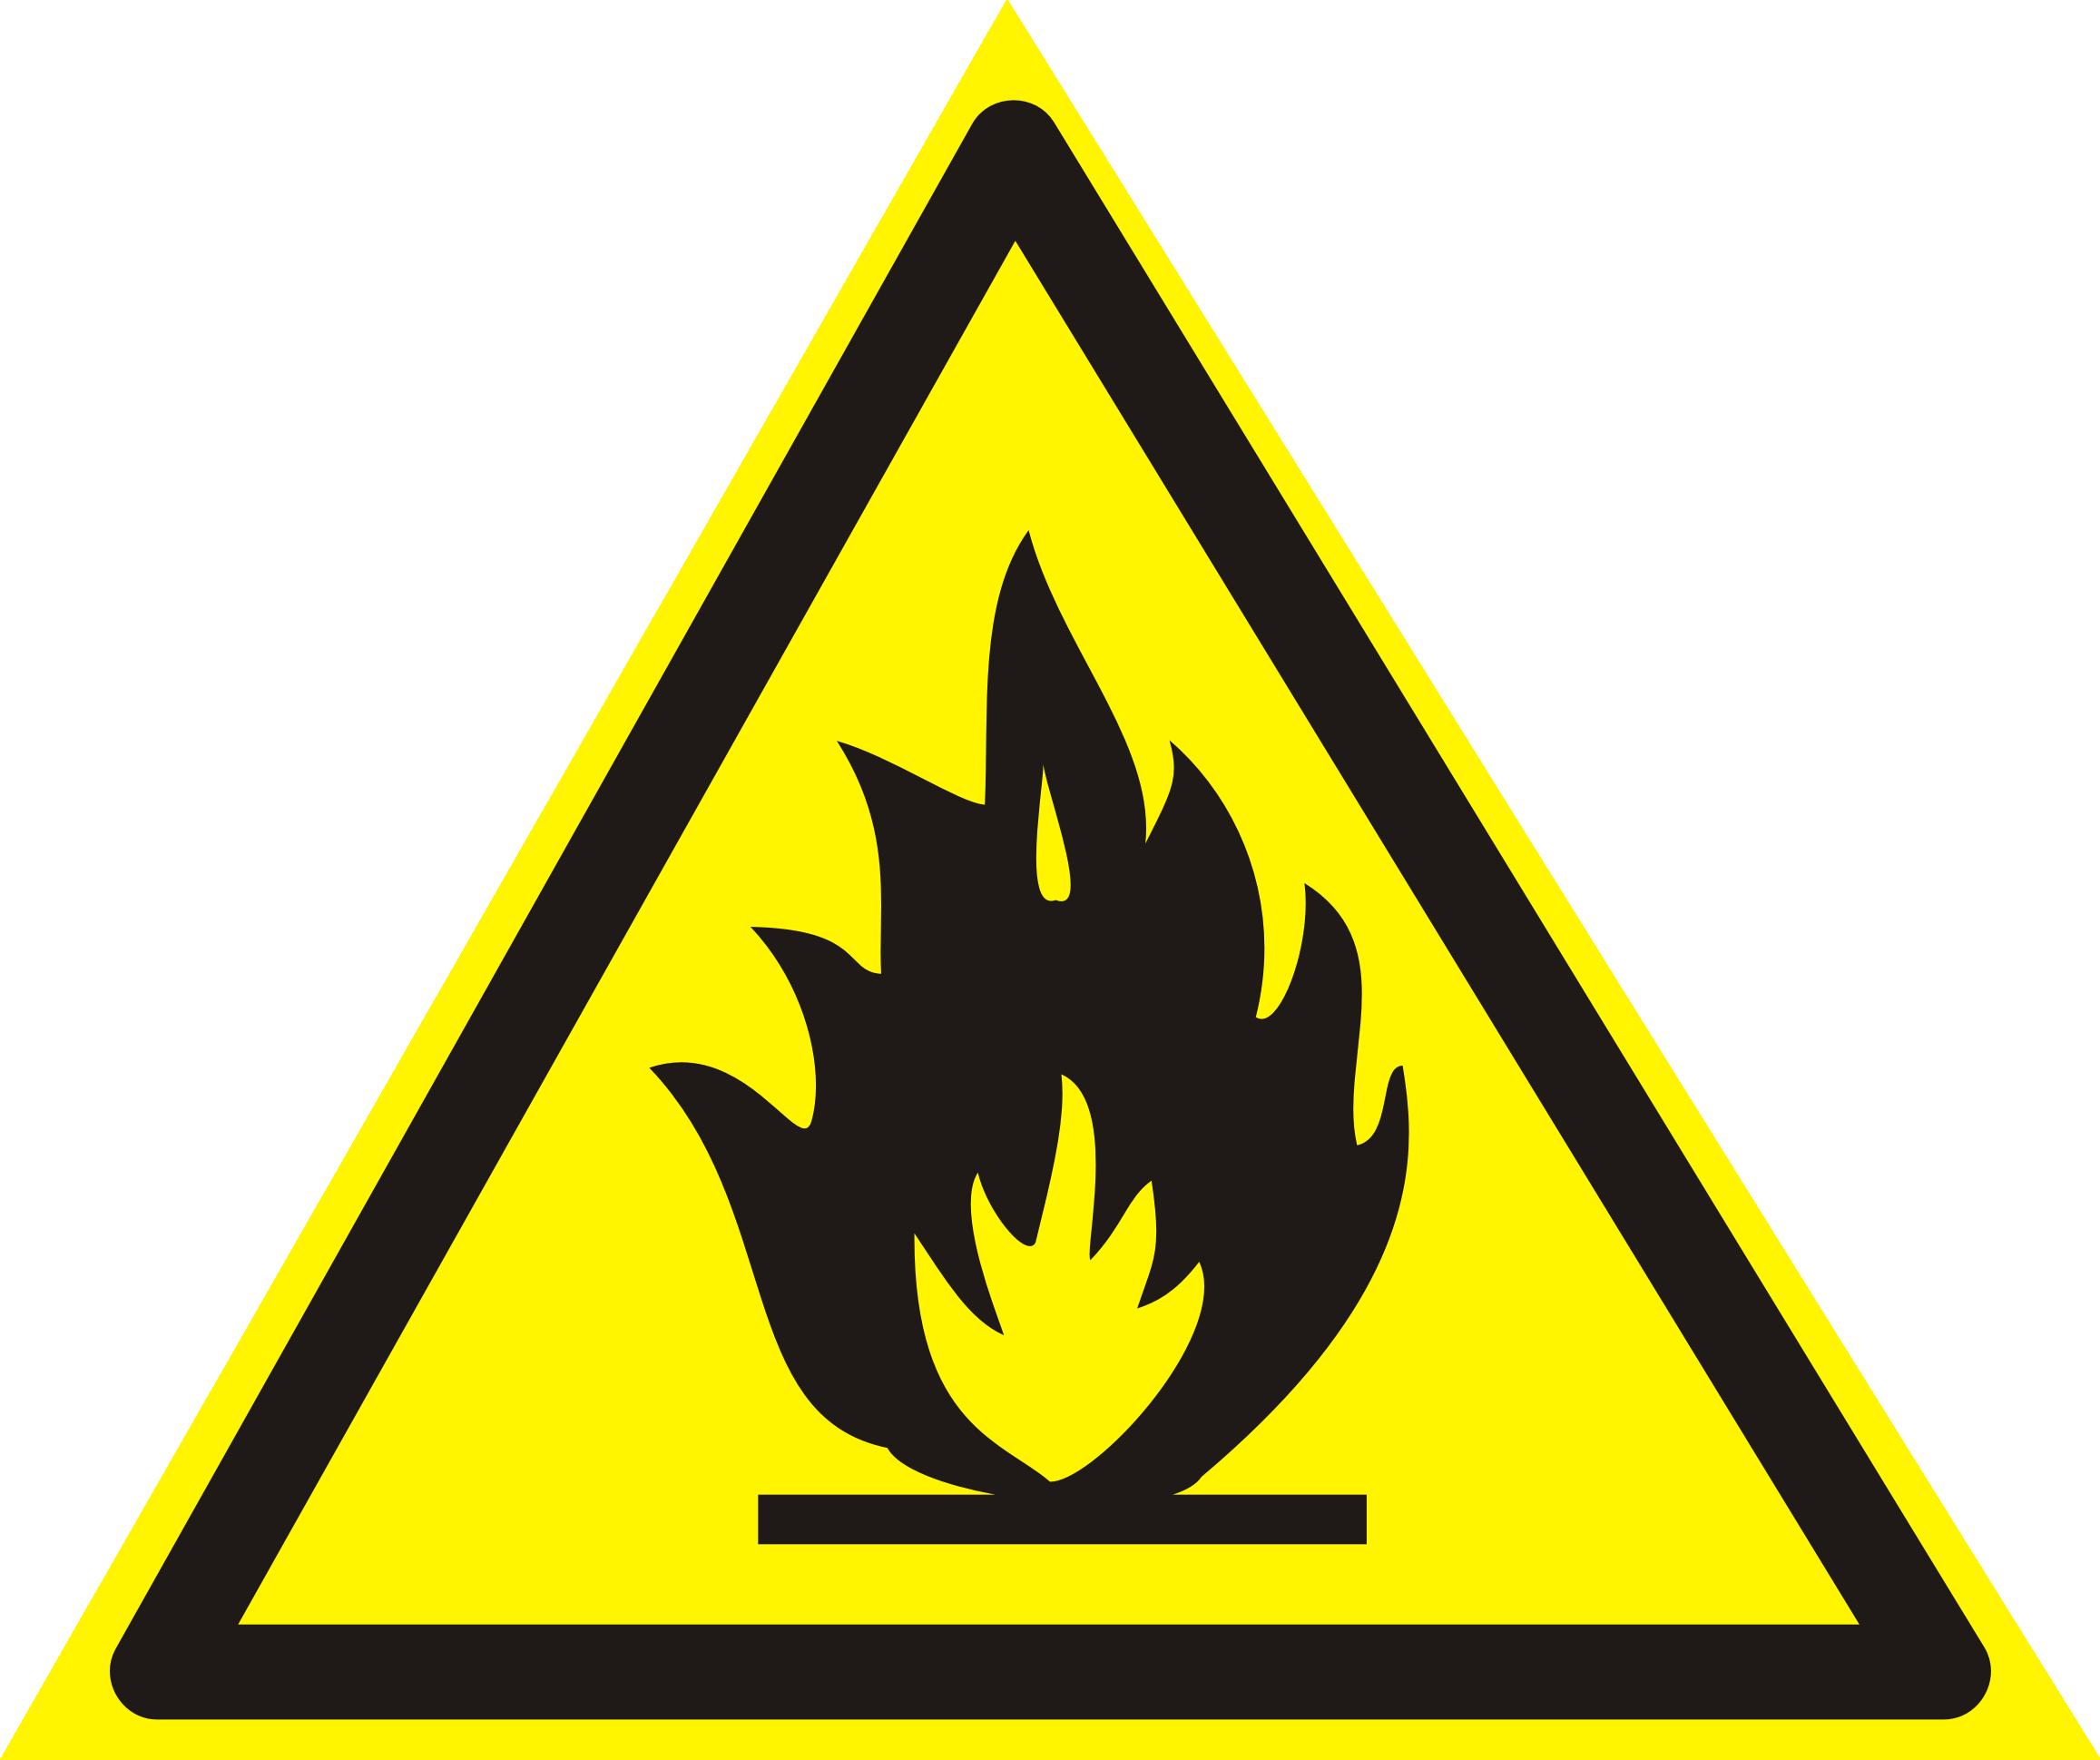 Fire hazard symbol smbolos de aviso warning signs pinterest fire hazard symbol biocorpaavc Gallery